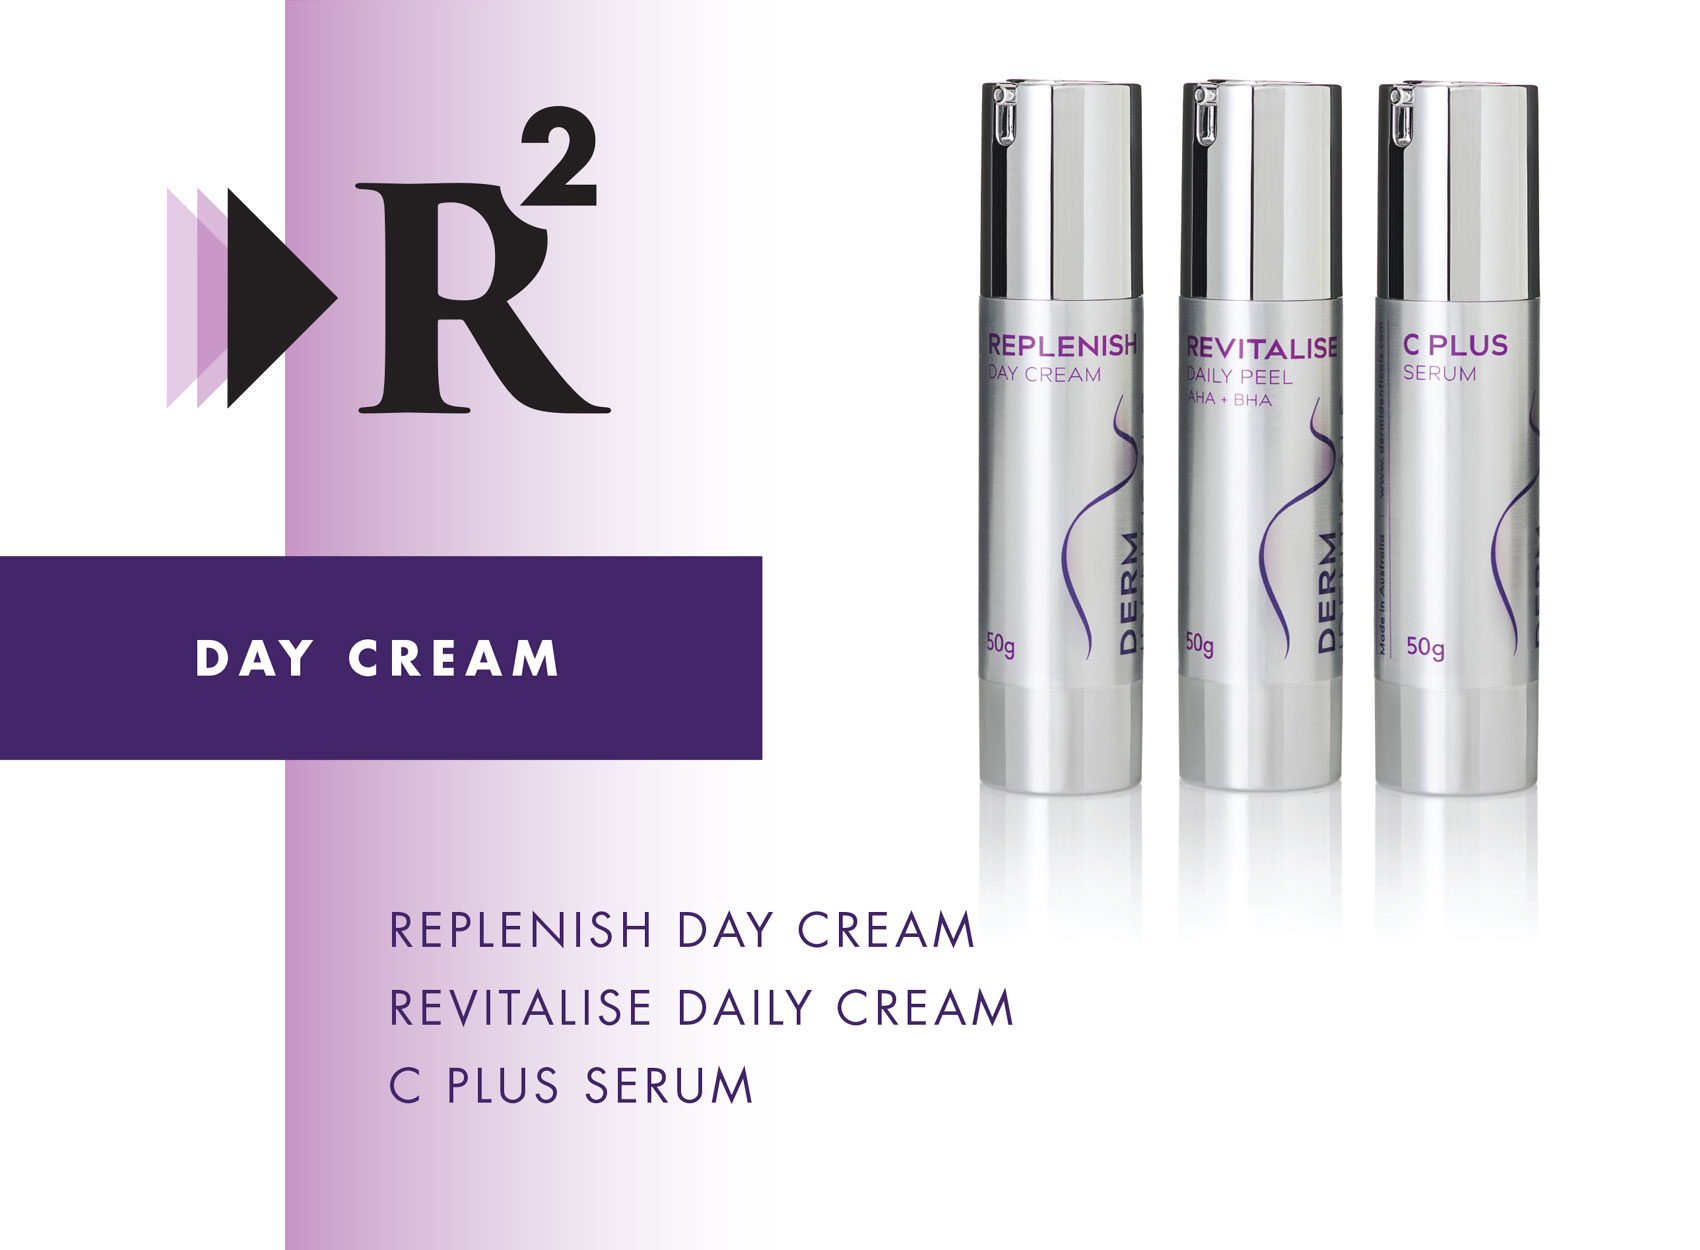 R2 Day Cream